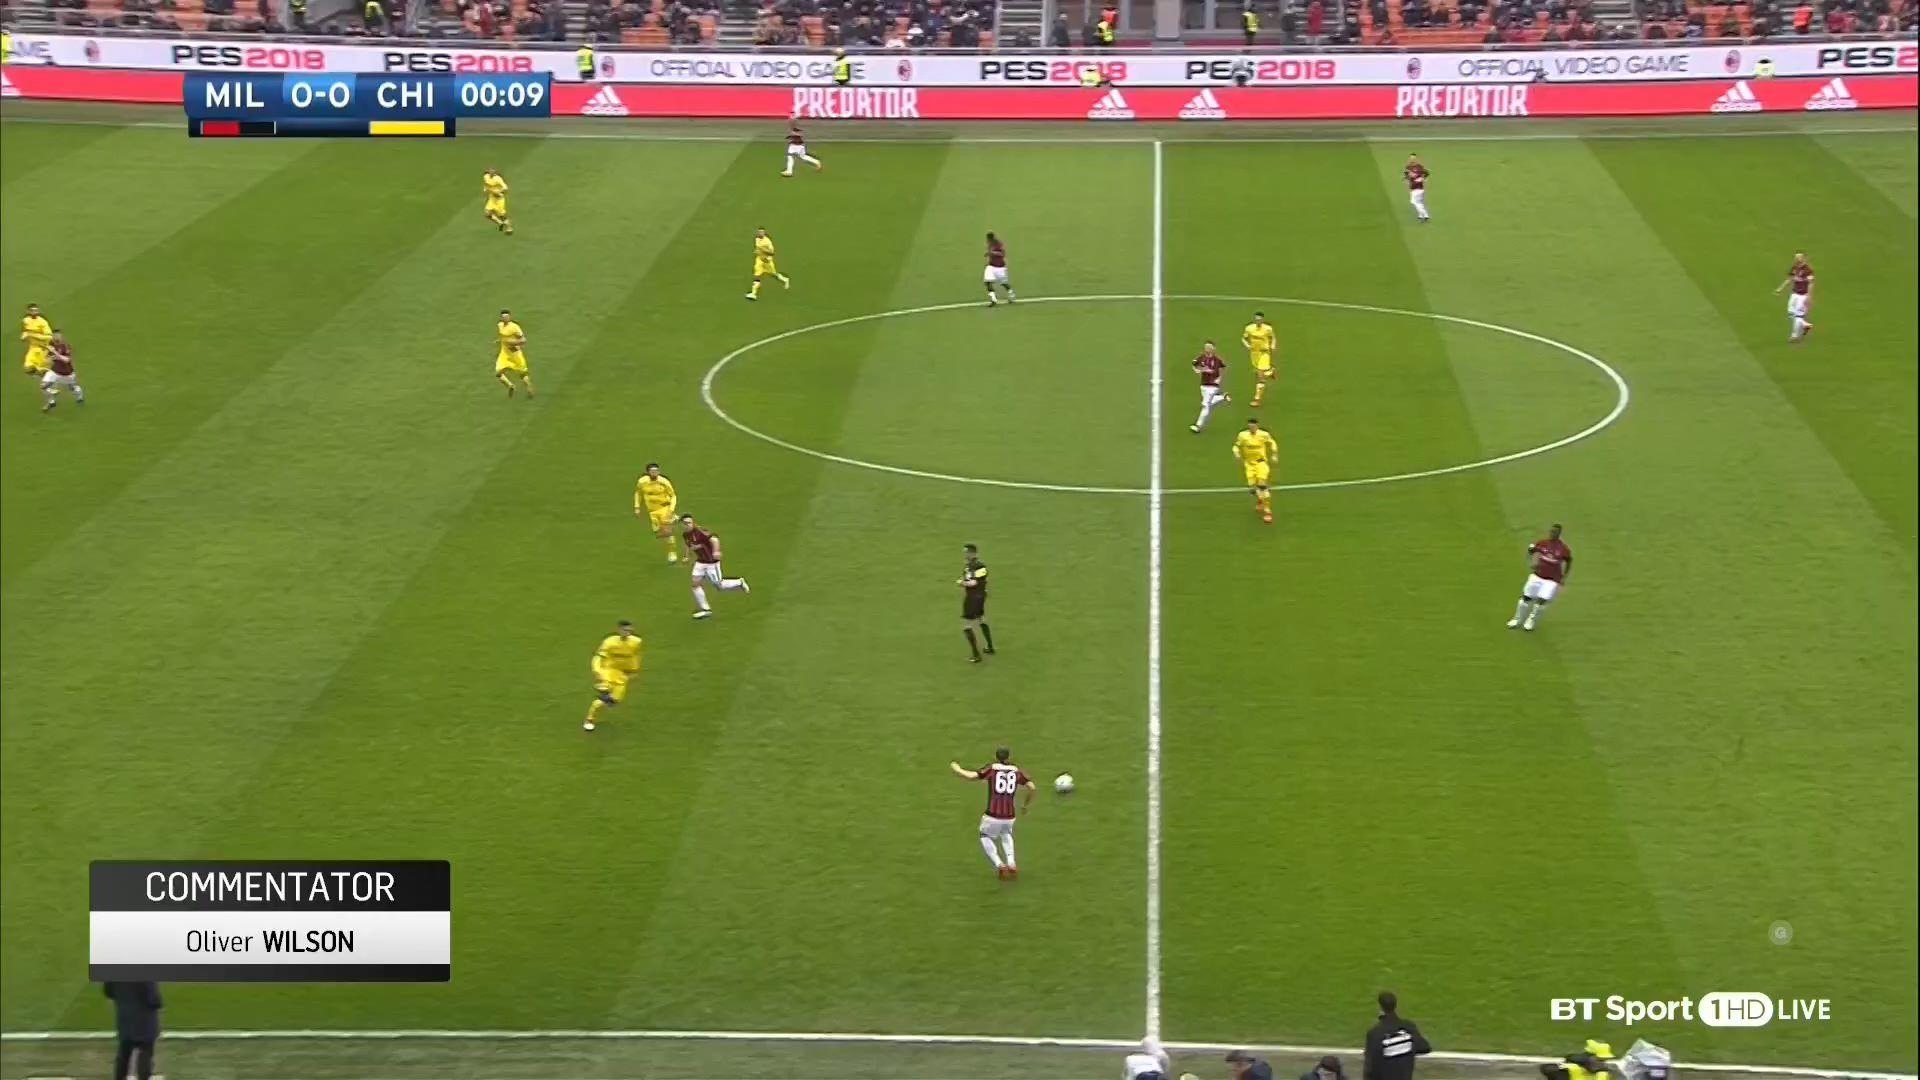 Pin on goals Serie A 17/18 AC Milan vs. Chievo Verona